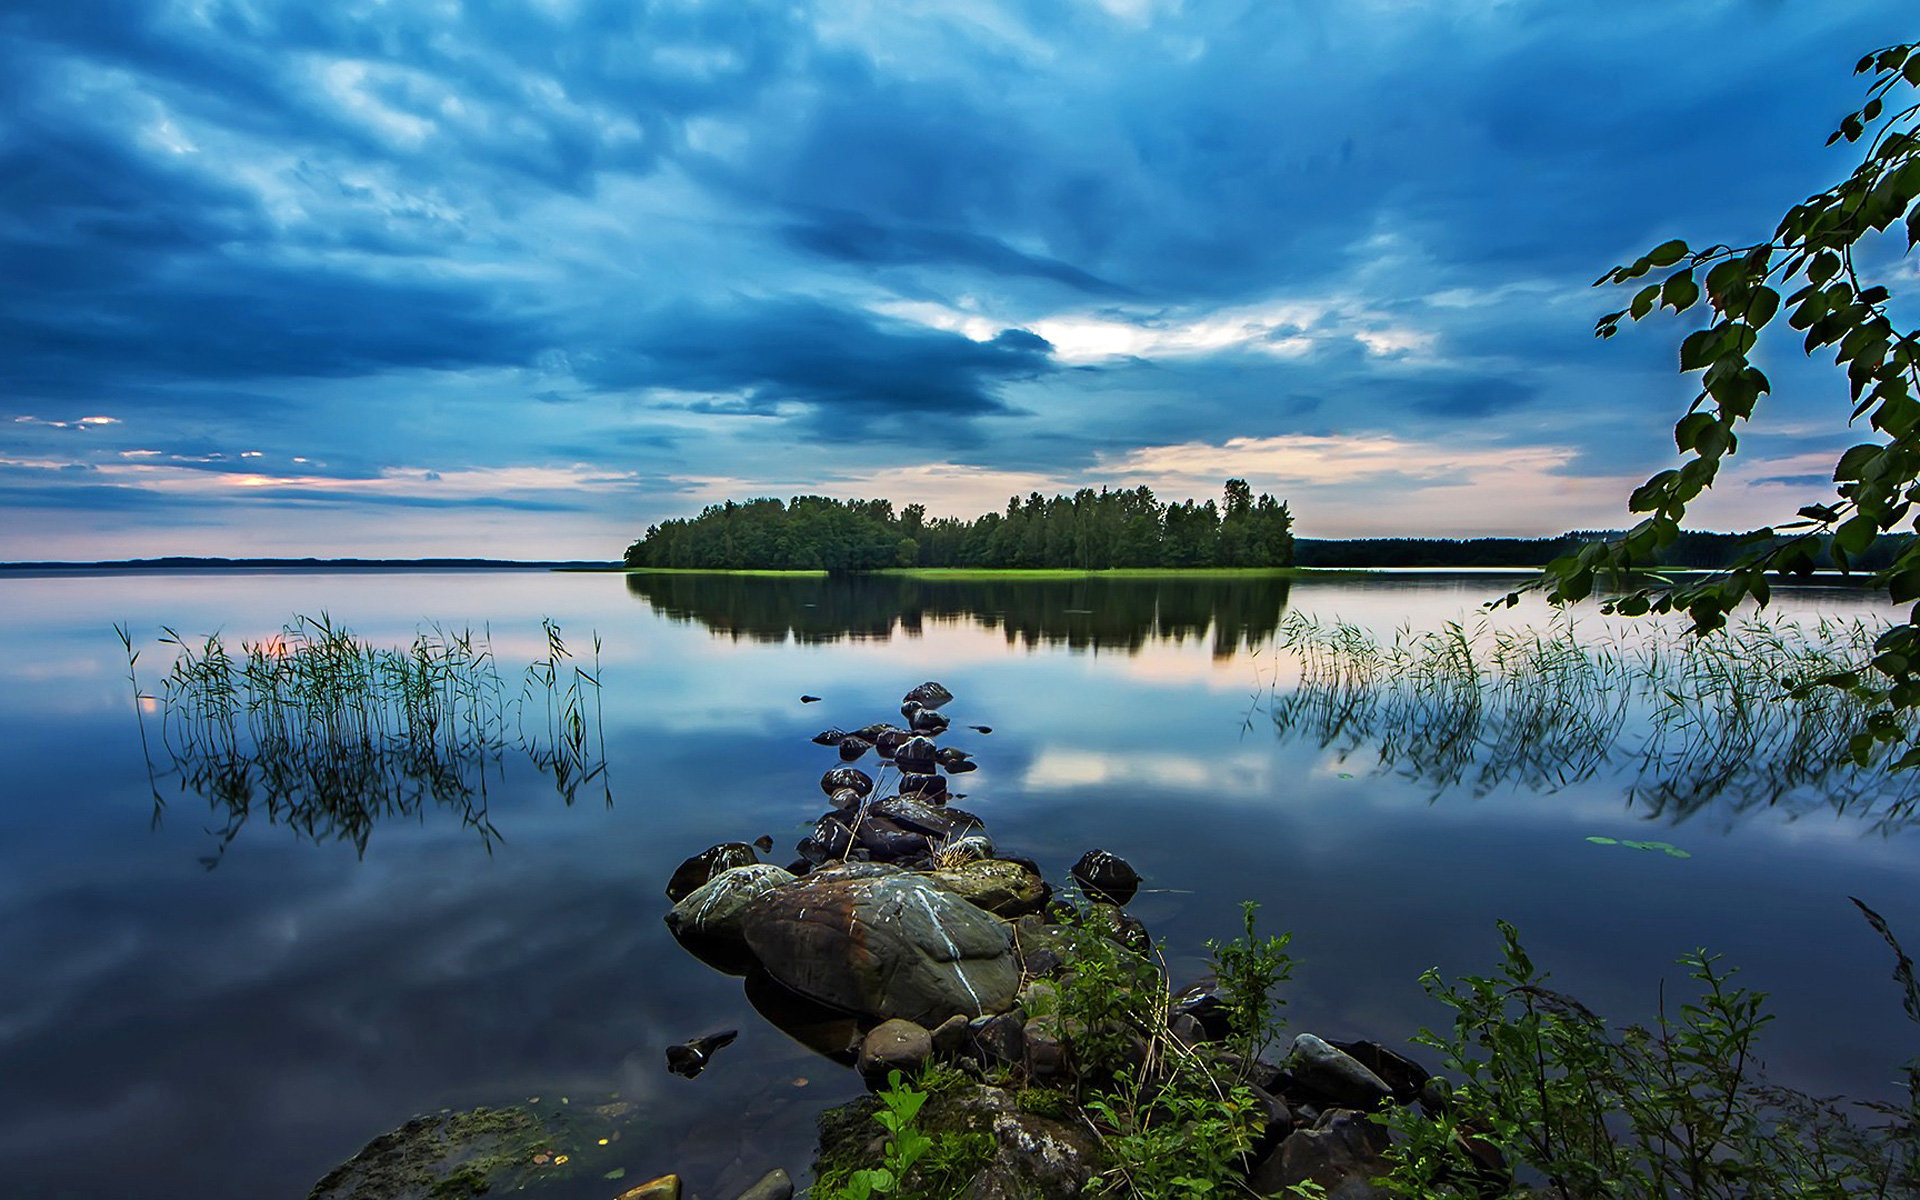 Pictures of summer lakes wallpaper wallpapersafari for Summer lake